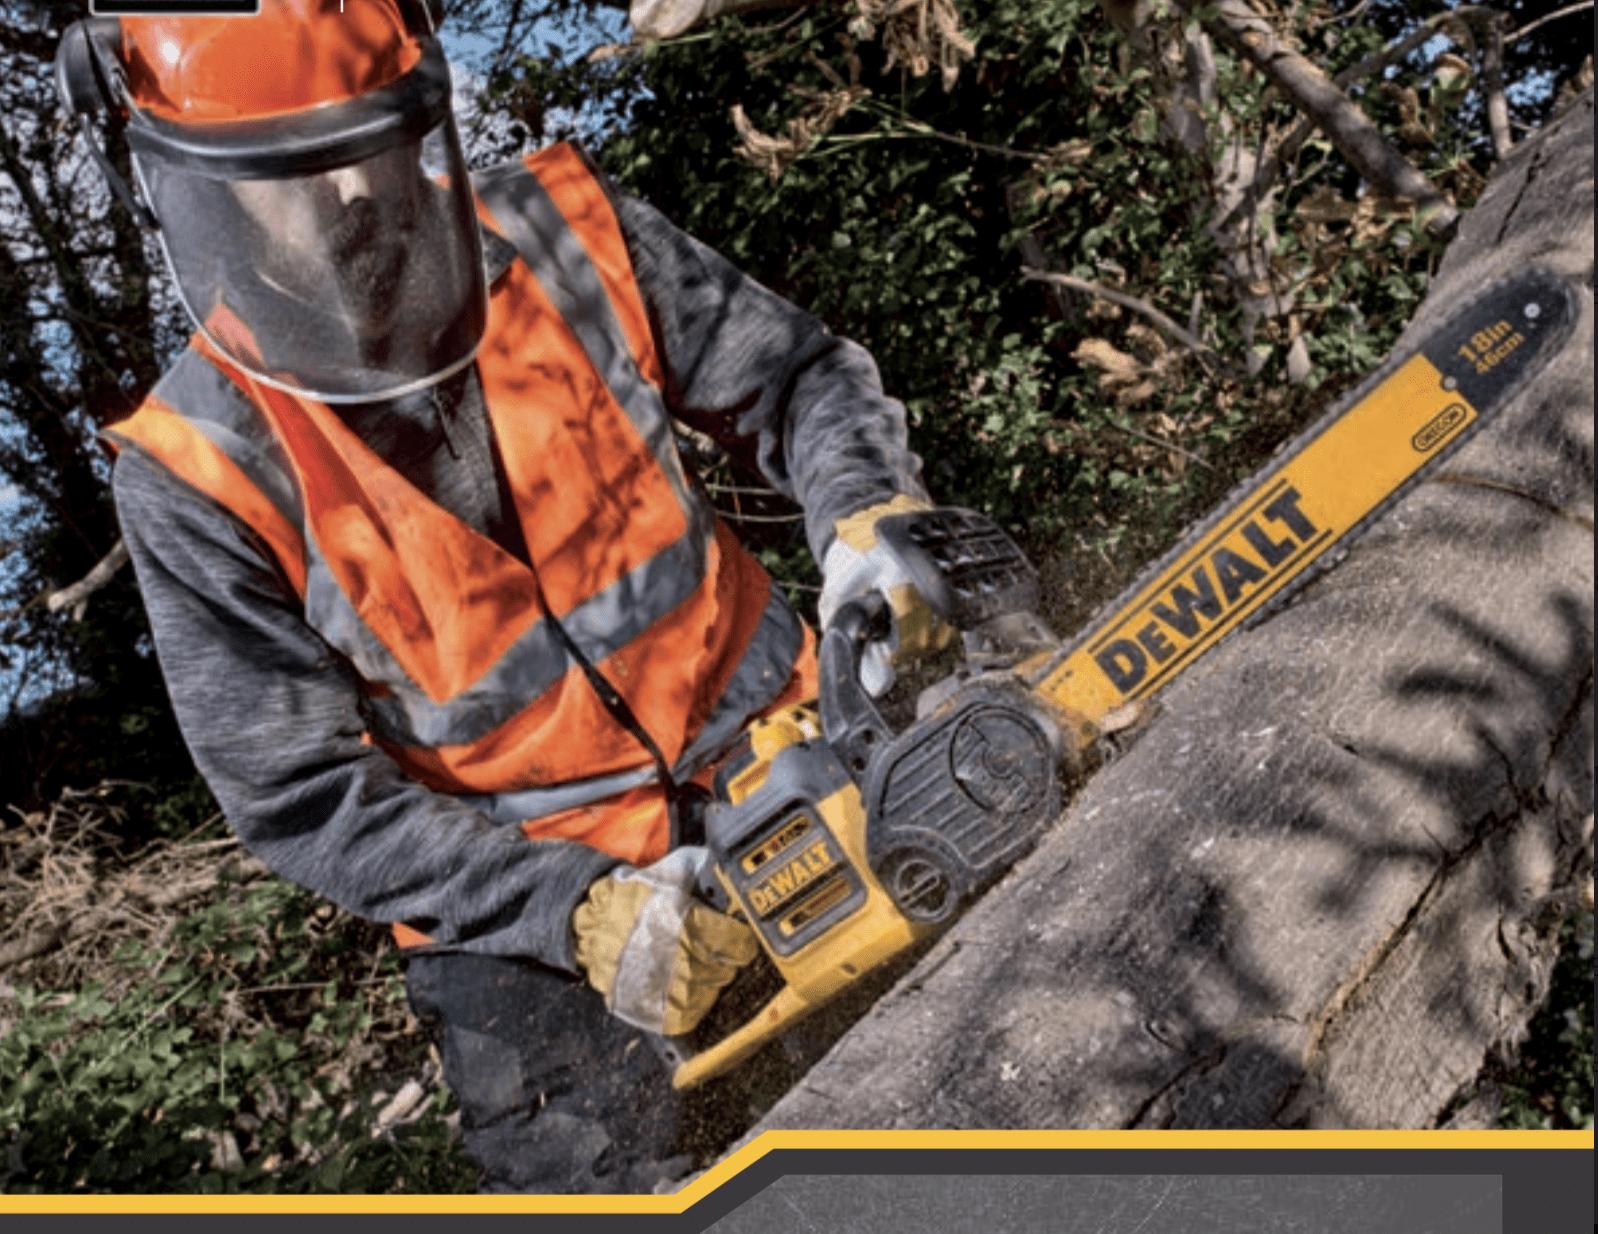 herramienta jardín DEWALT 2018 cartagena ferremart